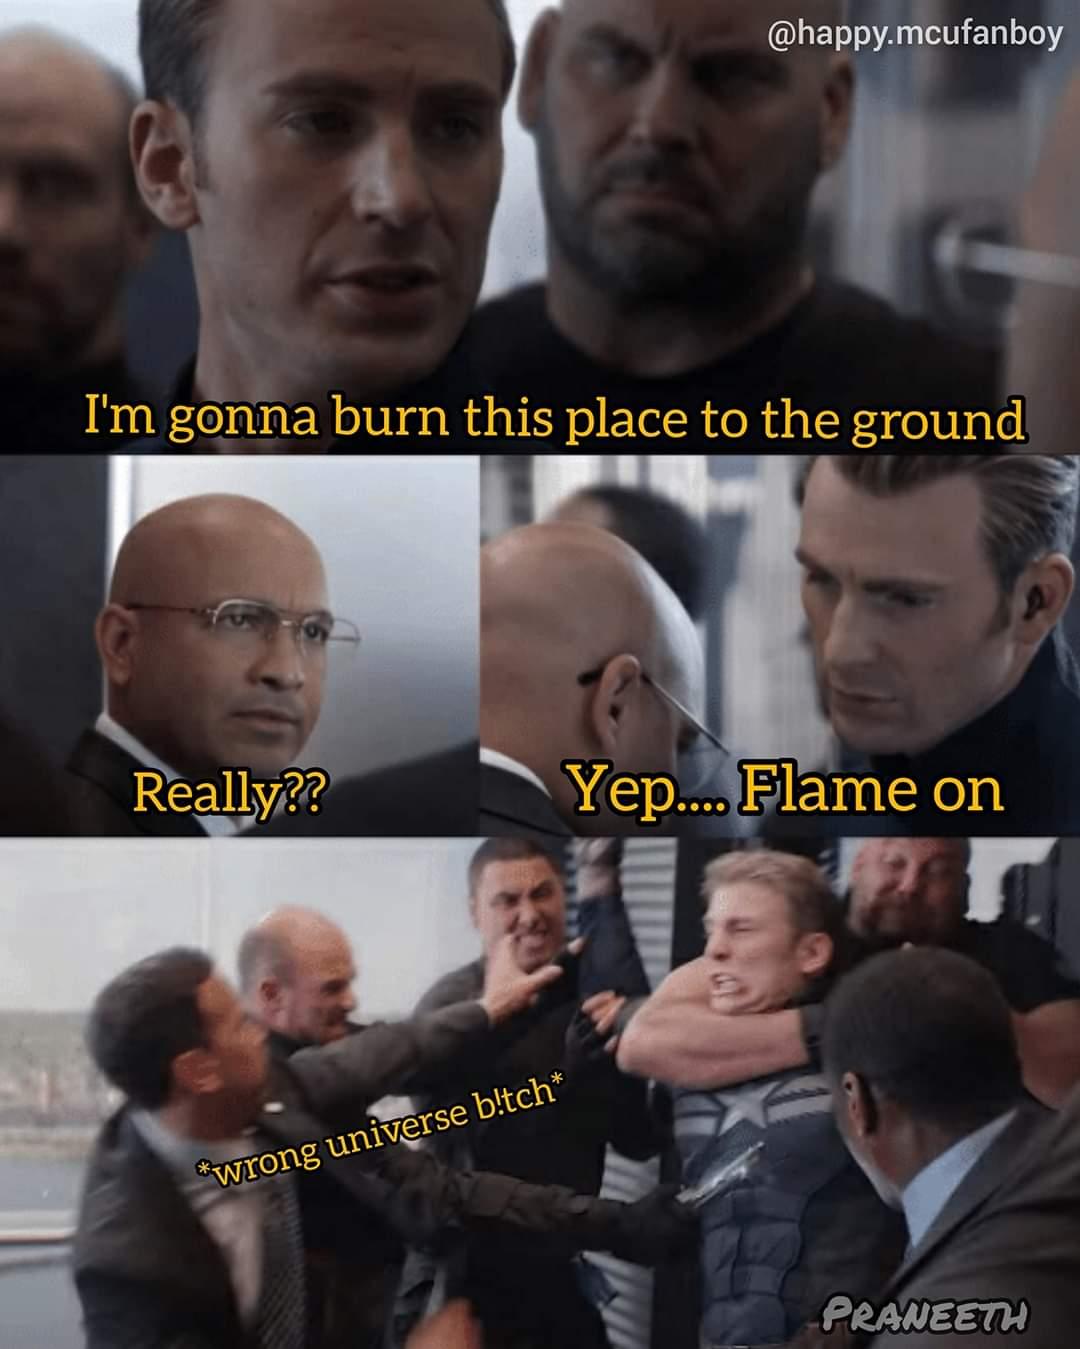 Flame on captain america dad joke